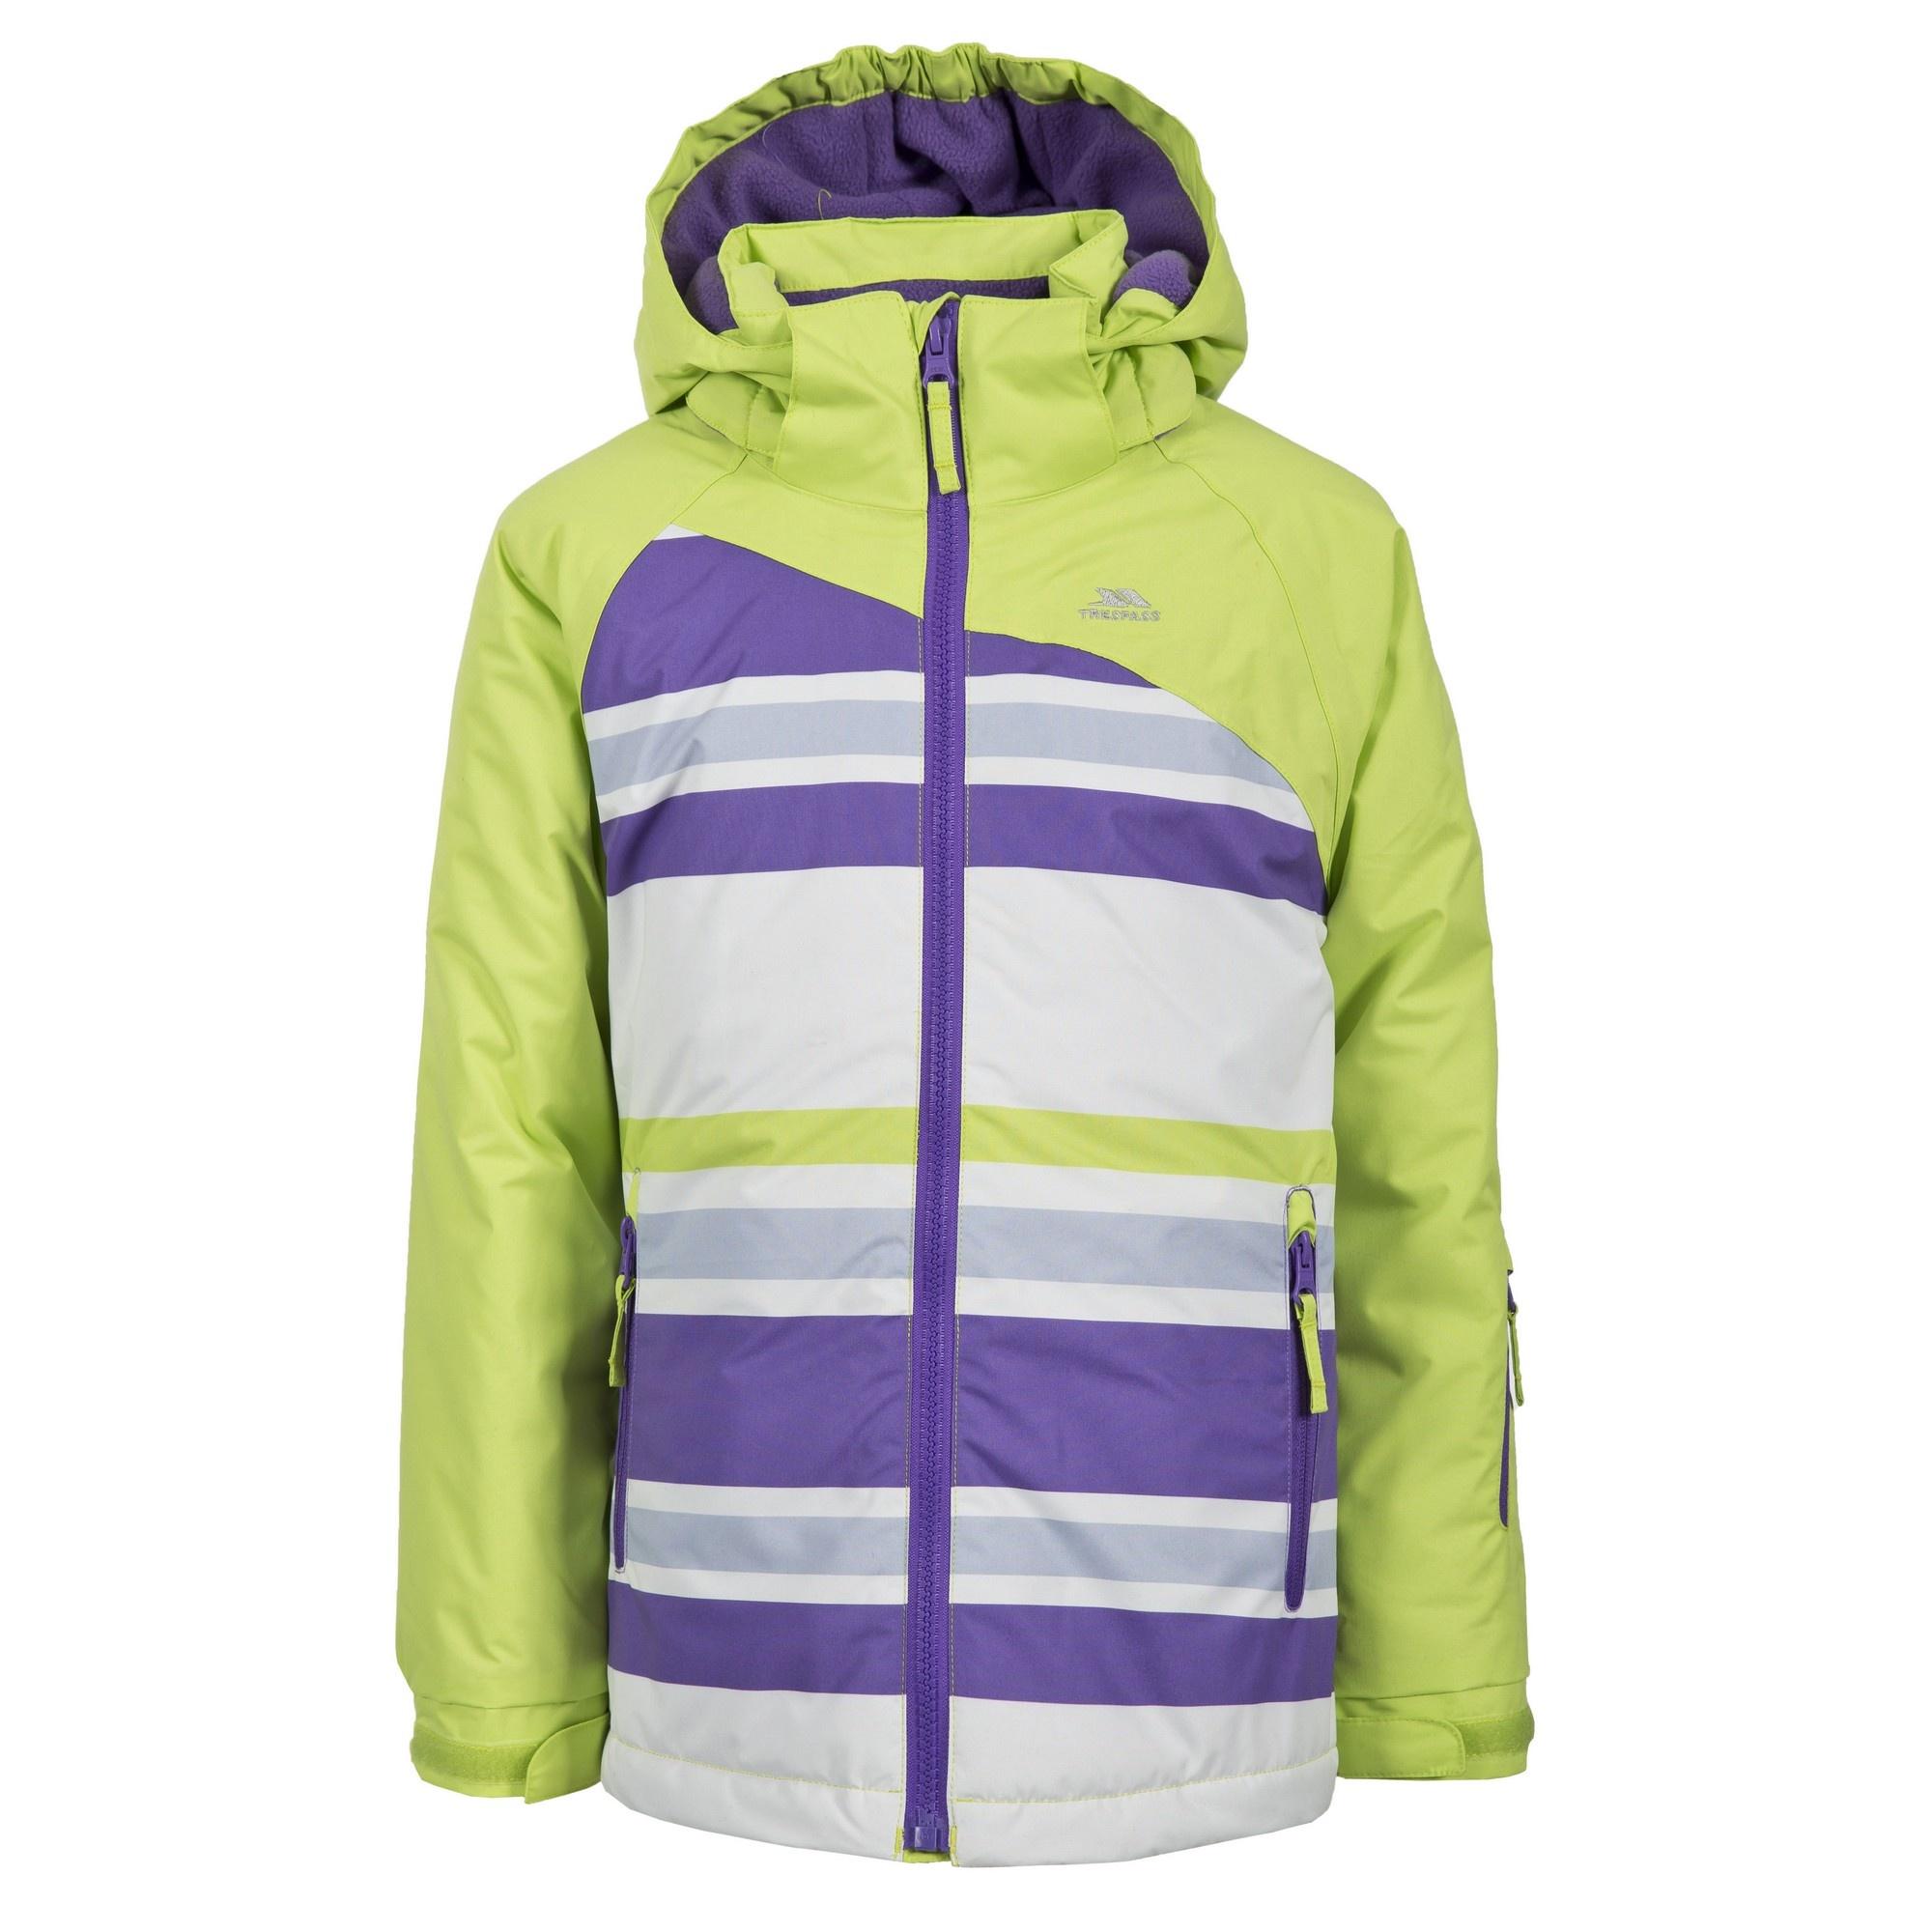 Trespass-Childrens-Girls-Golda-Waterproof-Hooded-Ski-Jacket